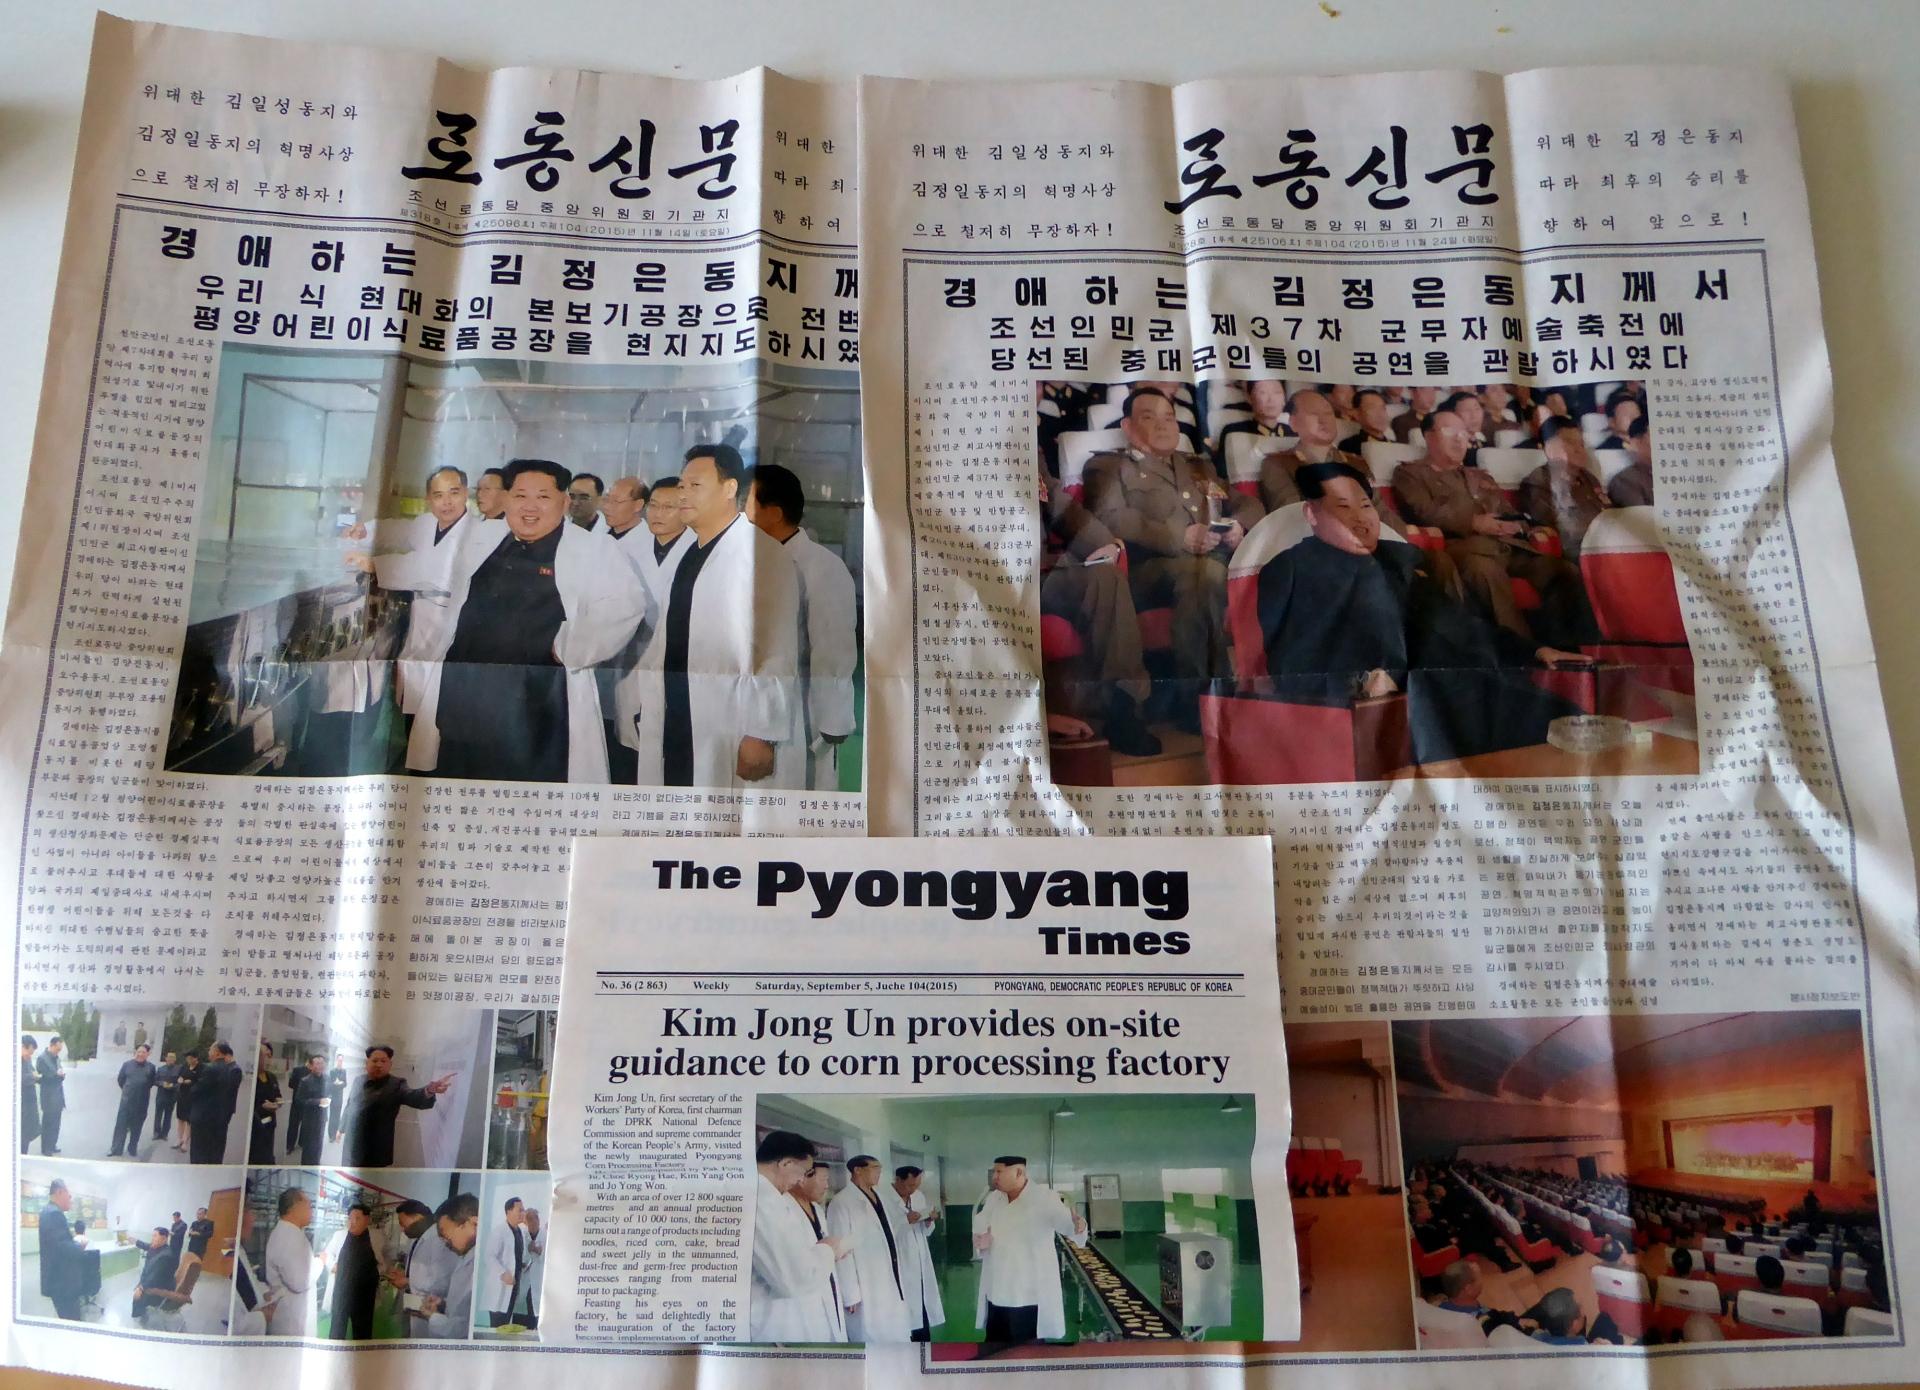 north korea newspaper news korean juche kim jong un